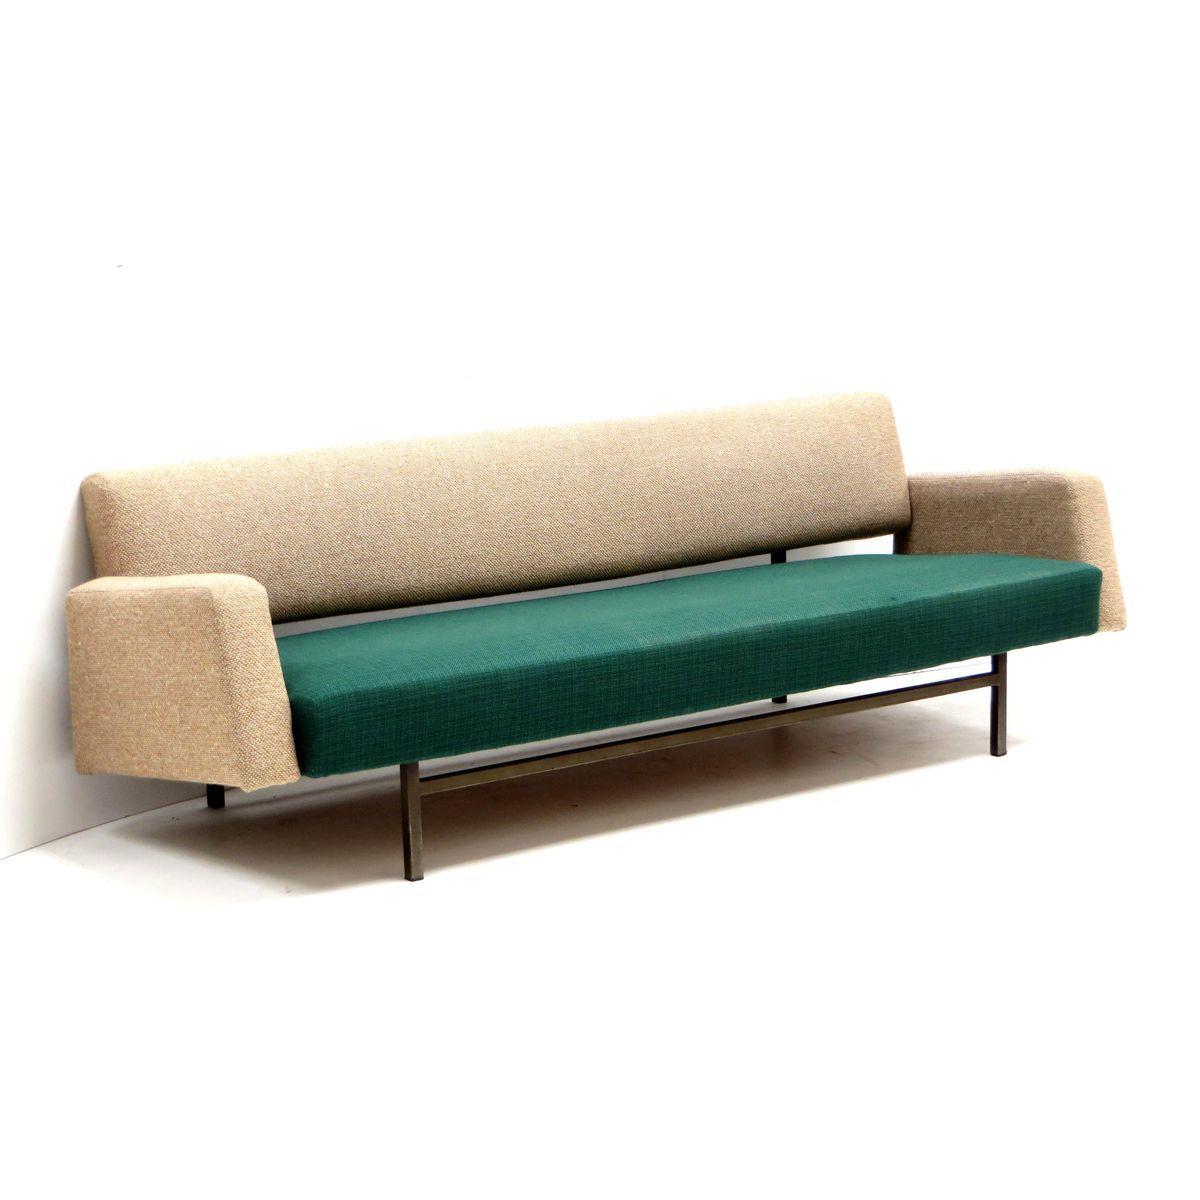 Mid Century Sofa 1960s For Sale At Pamono Vintage Sofa Mid